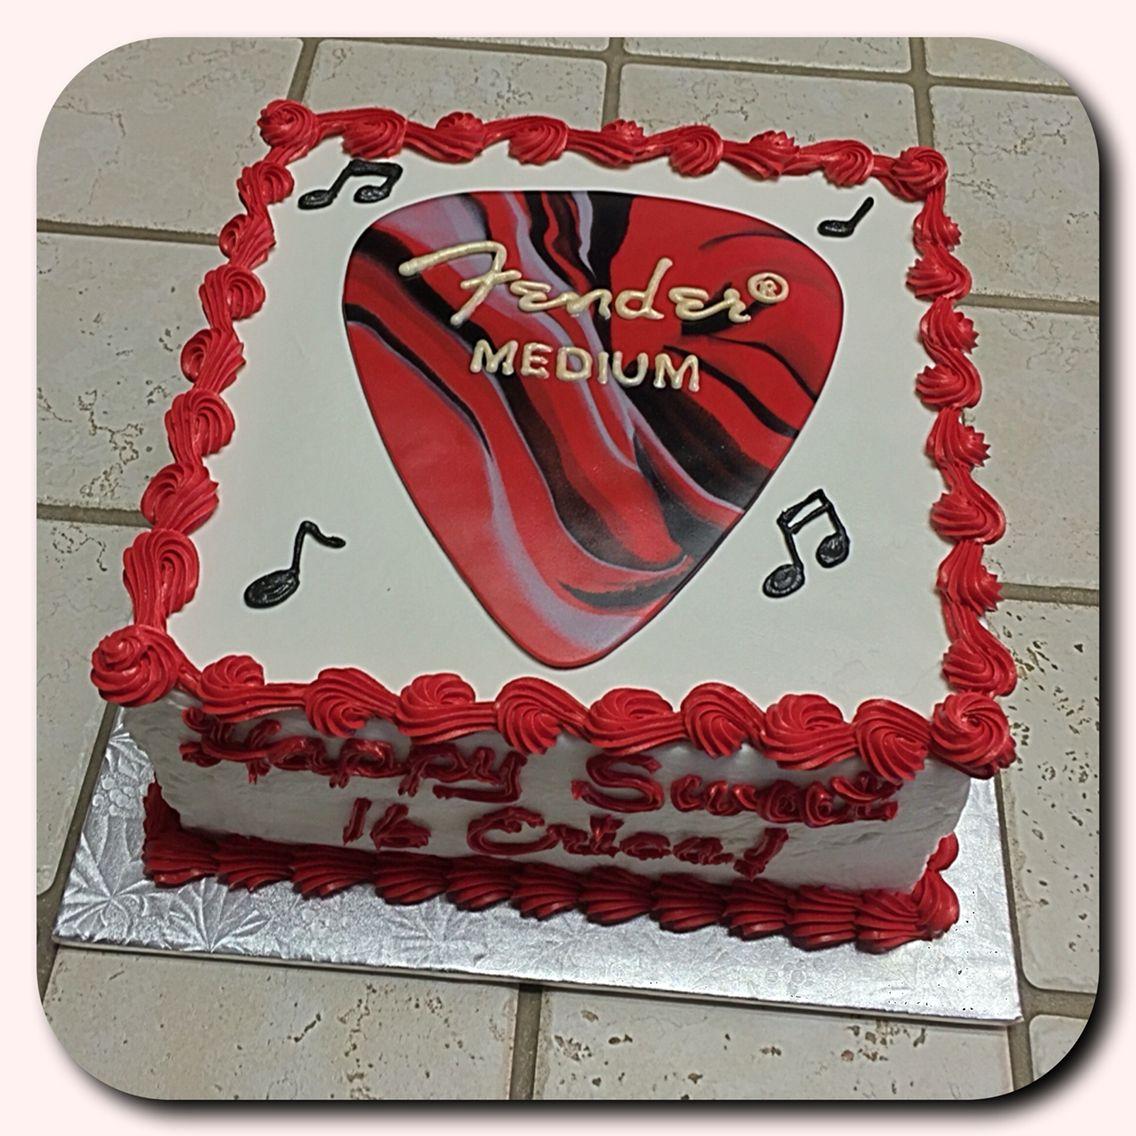 fender guitar pick cake music related cakes in 2019 guitar cake birthday cake cake. Black Bedroom Furniture Sets. Home Design Ideas